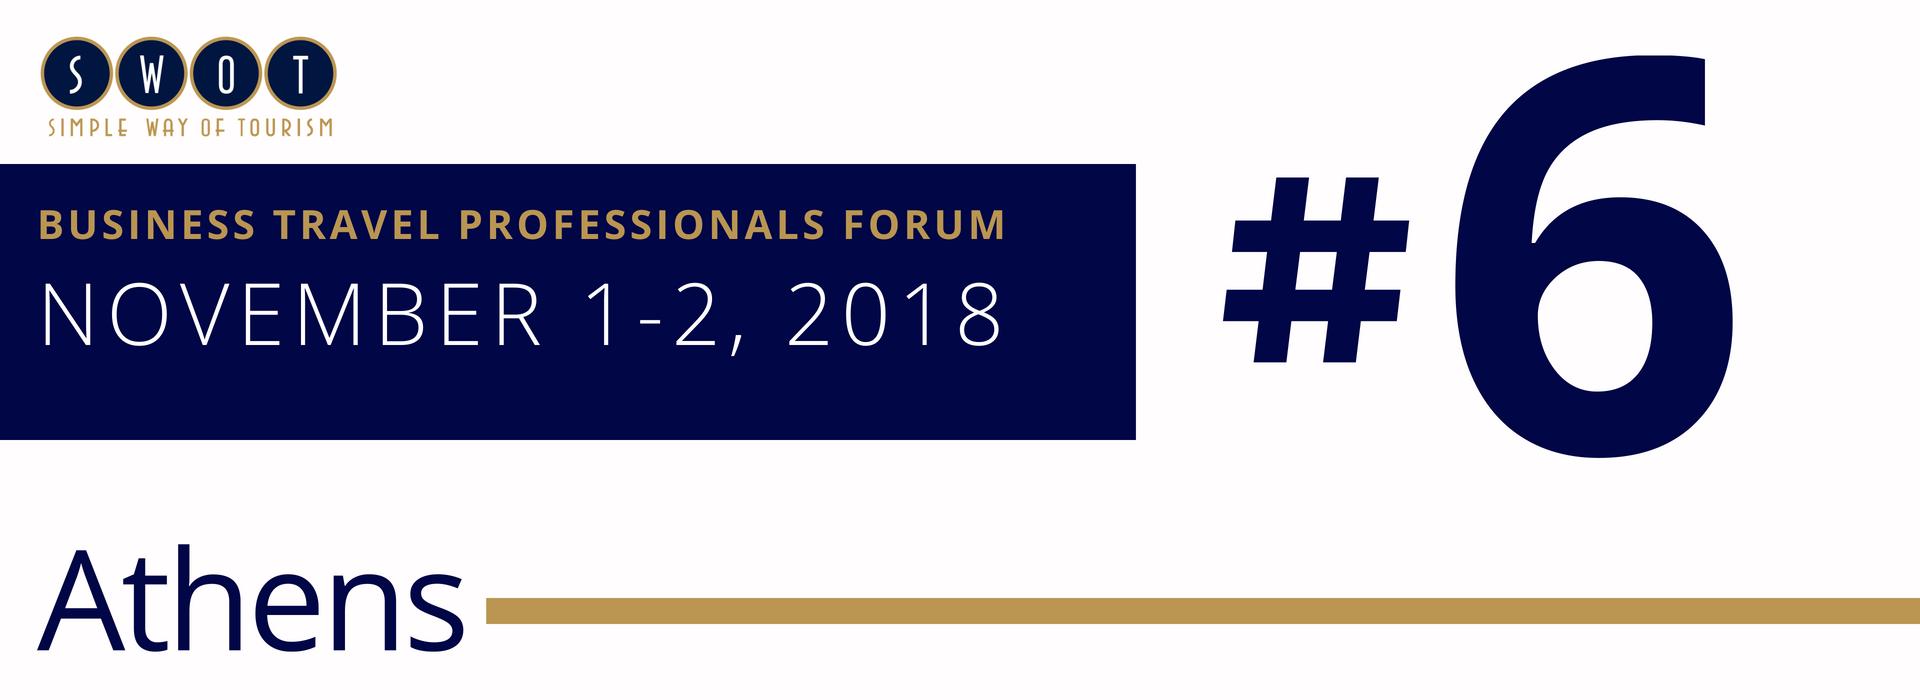 Business Travel Professionals Forum 2018